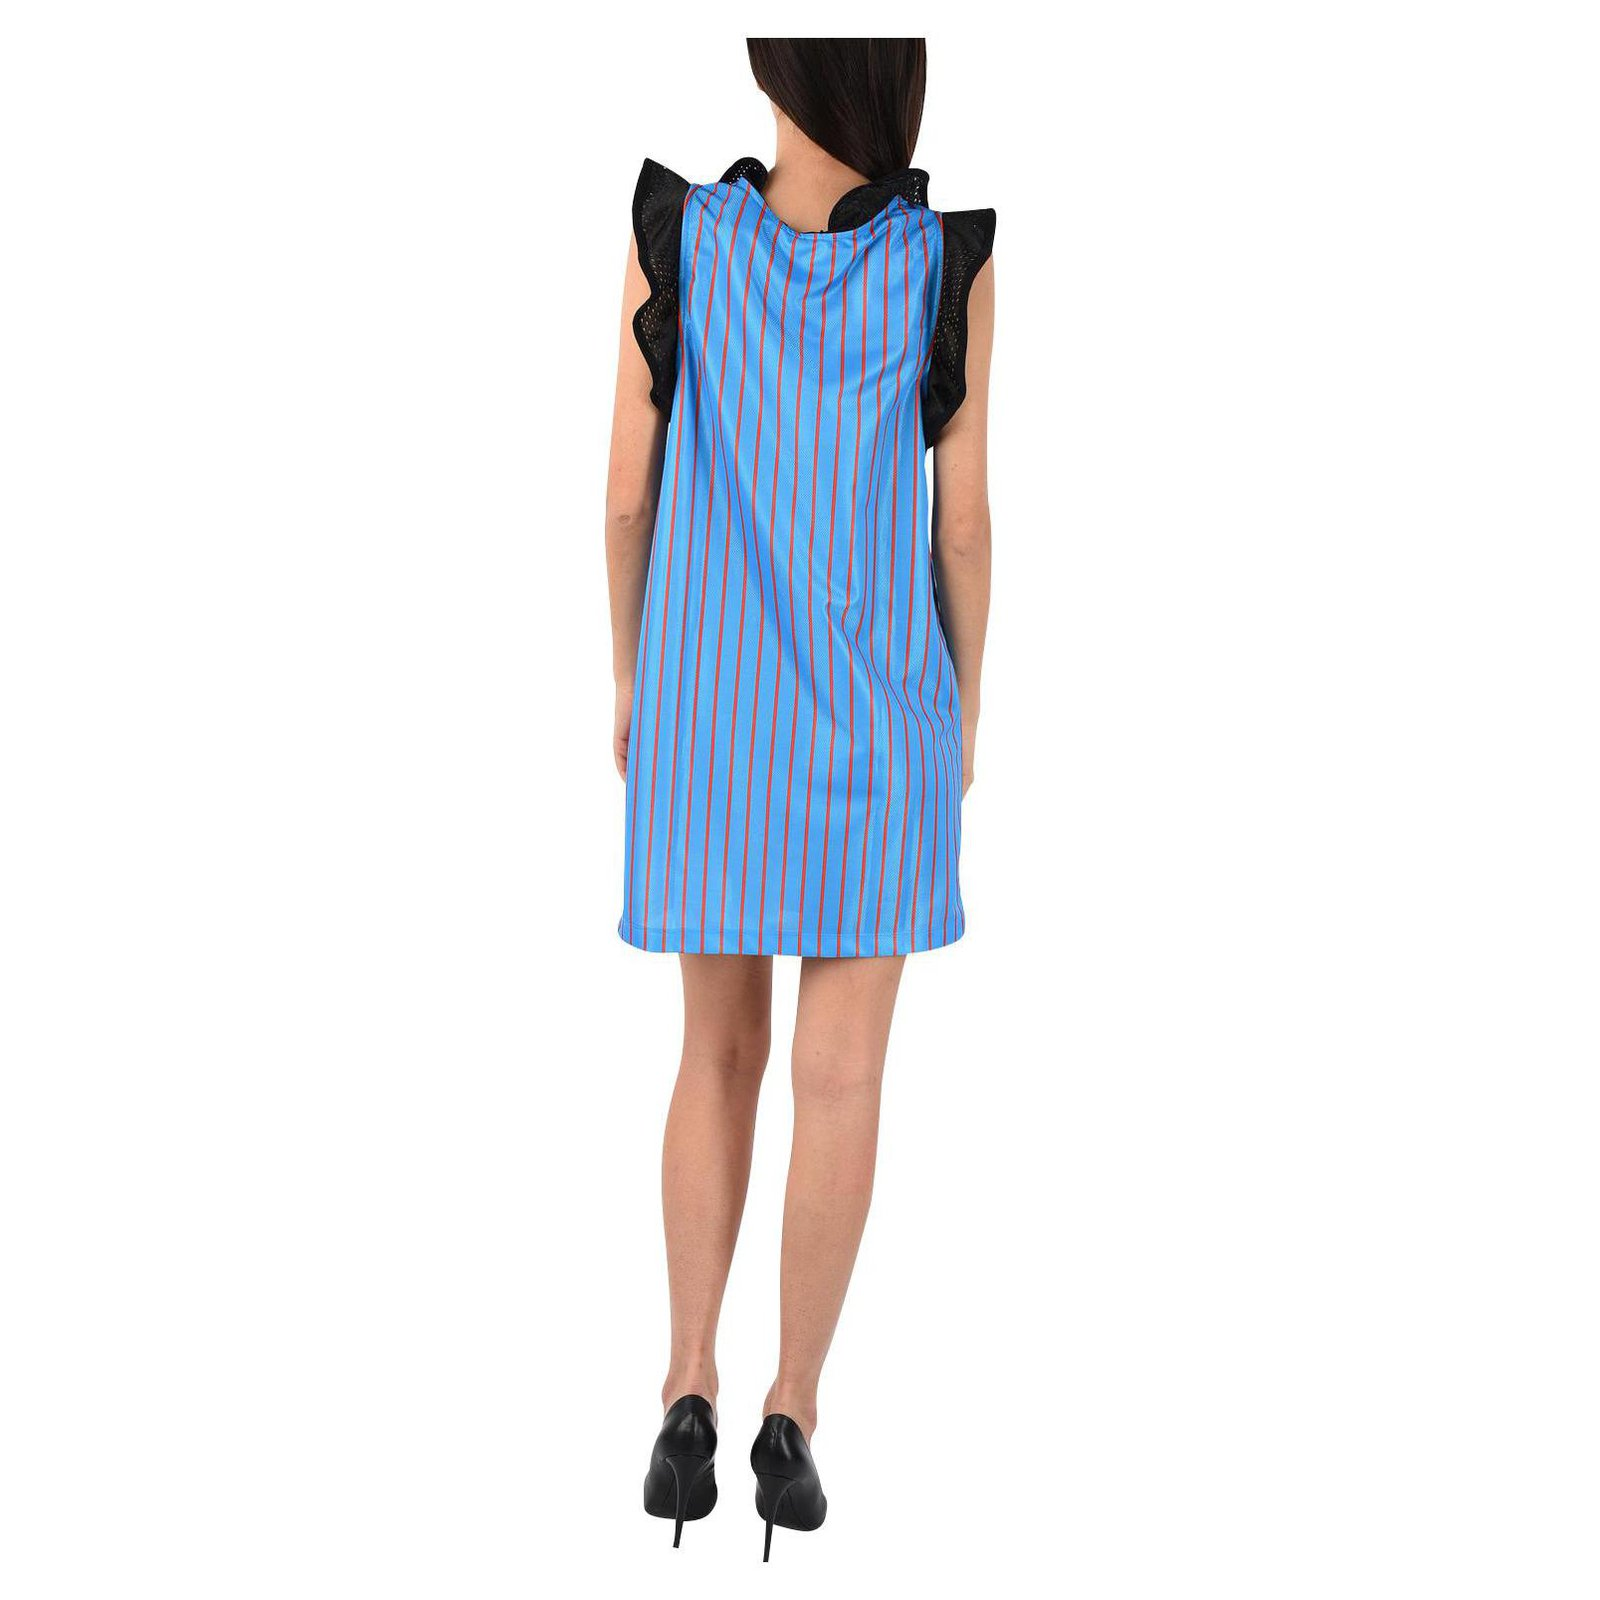 983a22f6 Kenzo Kenzo dress new Dresses Polyester Other ref.125434 - Joli Closet